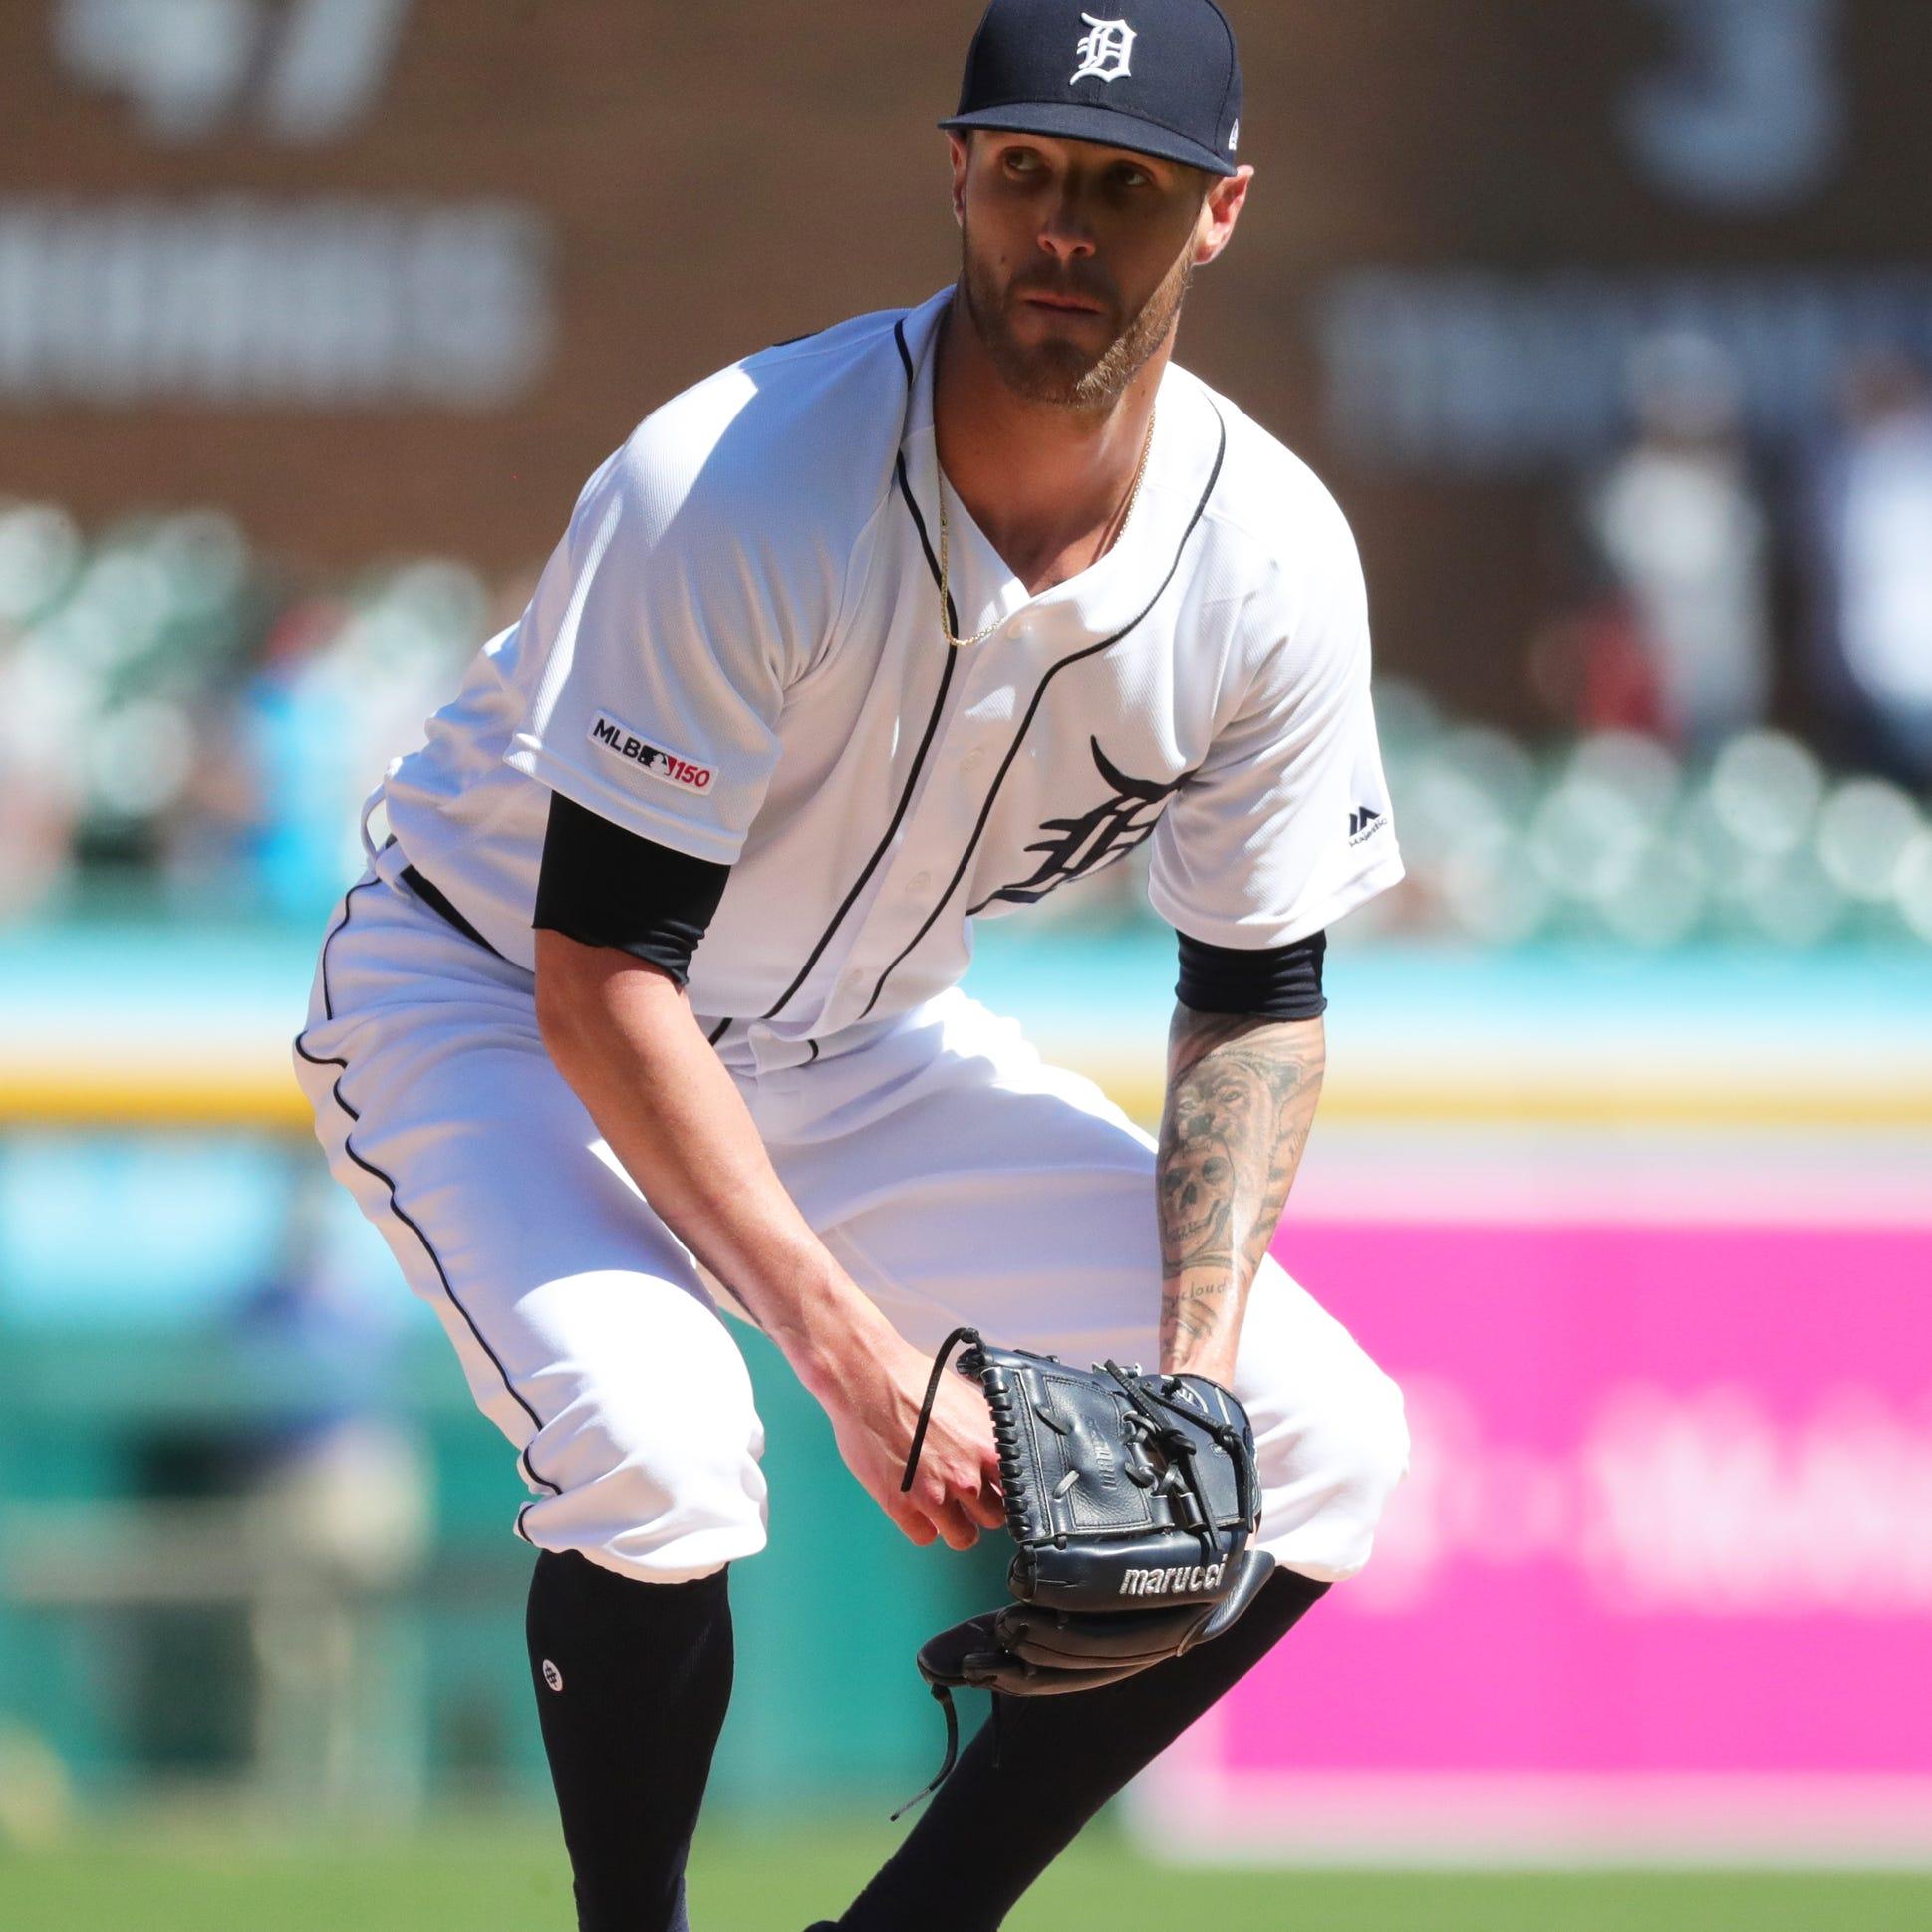 Detroit Tigers closer Shane Greene's save streak slams to a halt in 5-2 loss to Marlins